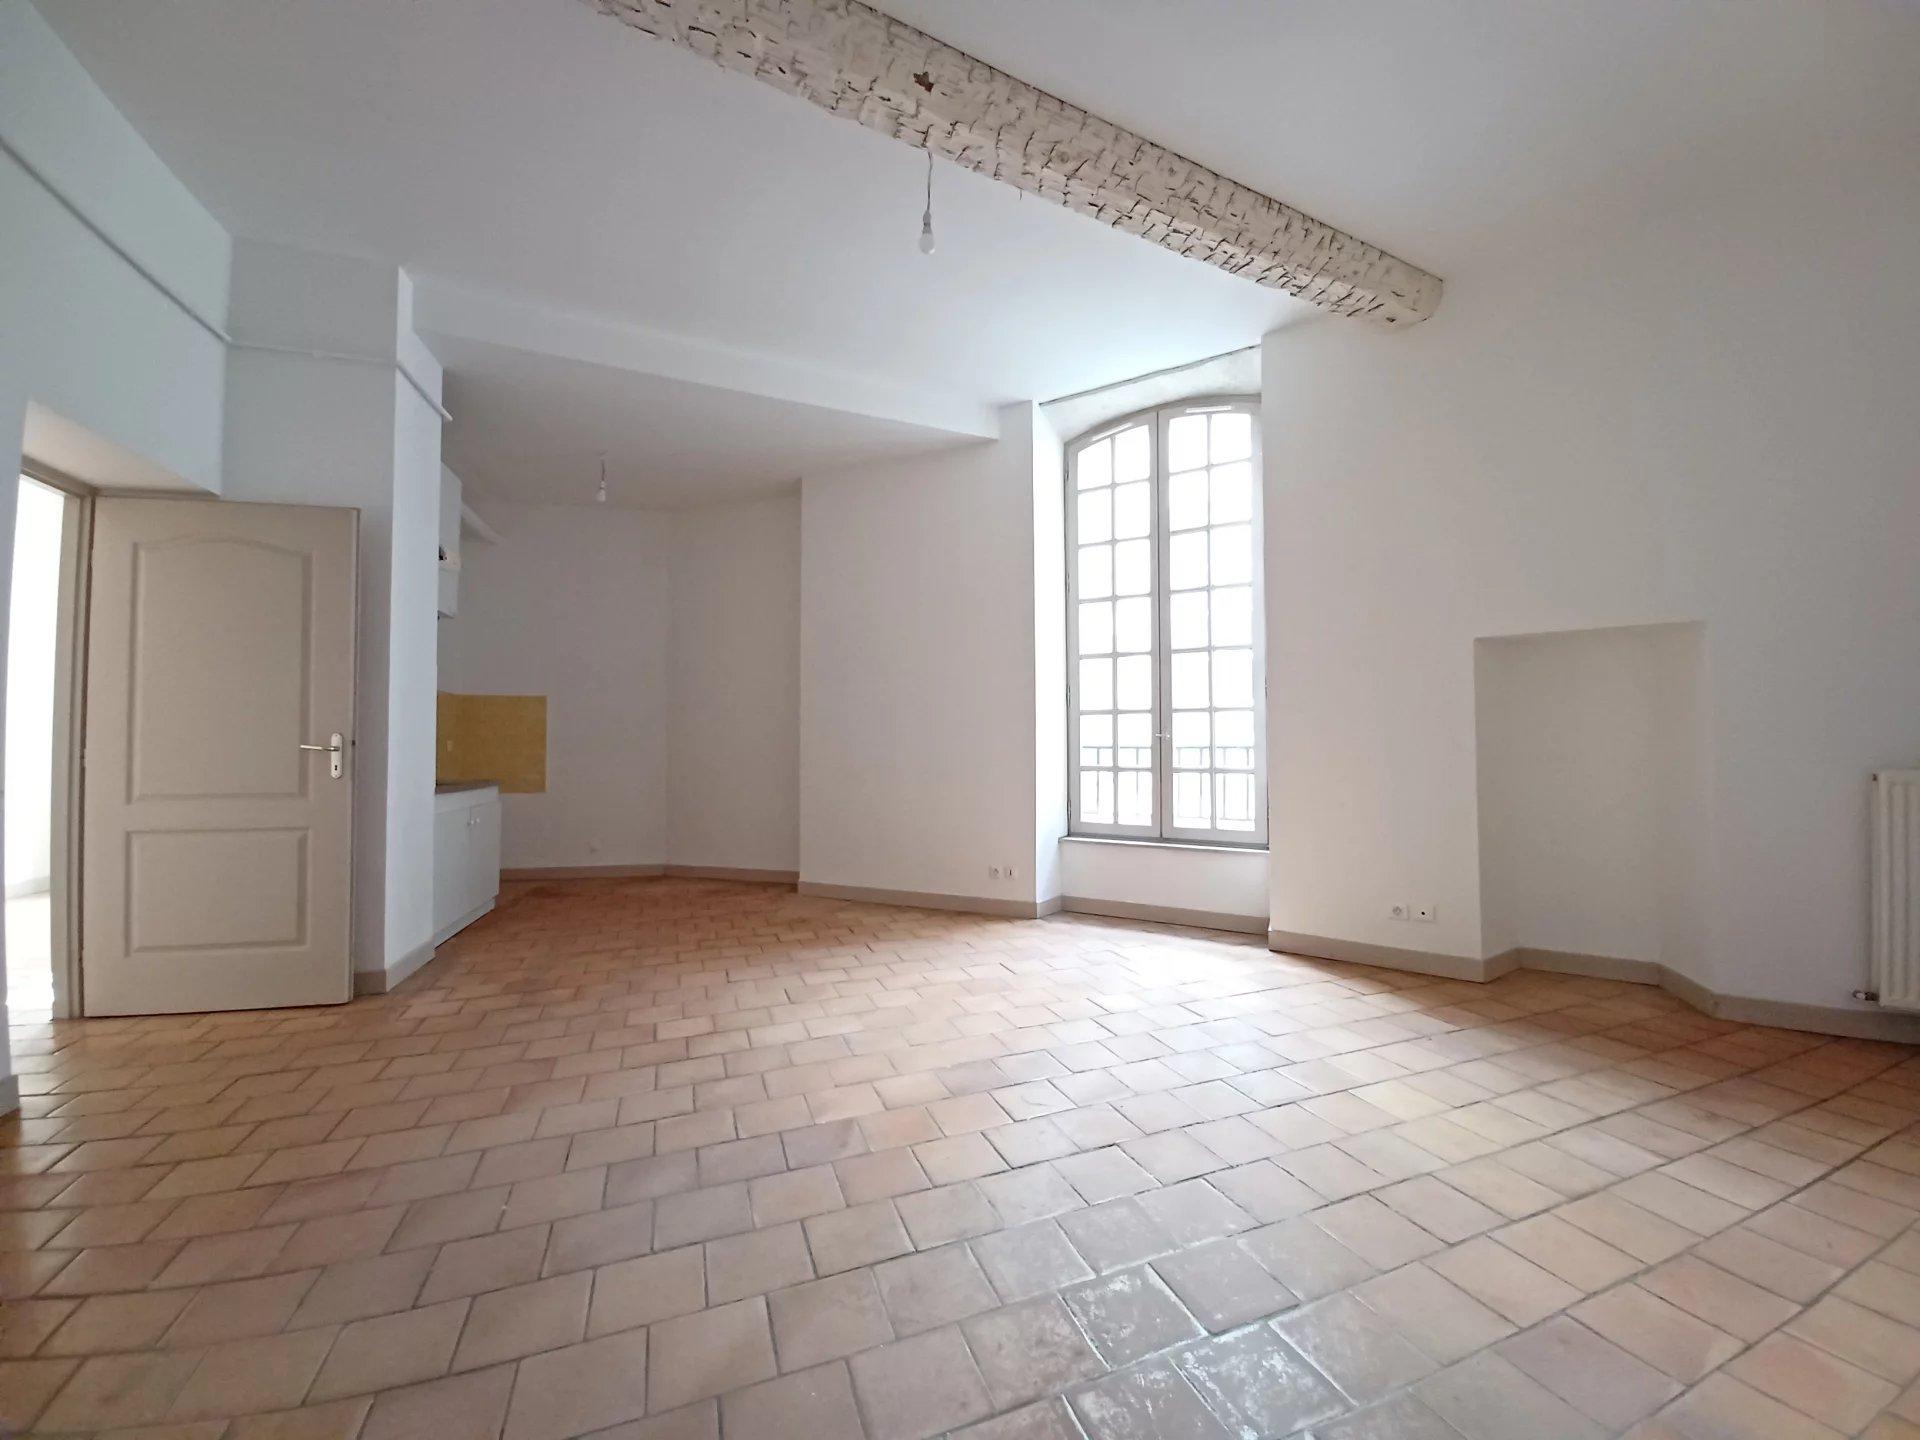 Location Appartement BEAUCAIRE Mandat : 0050